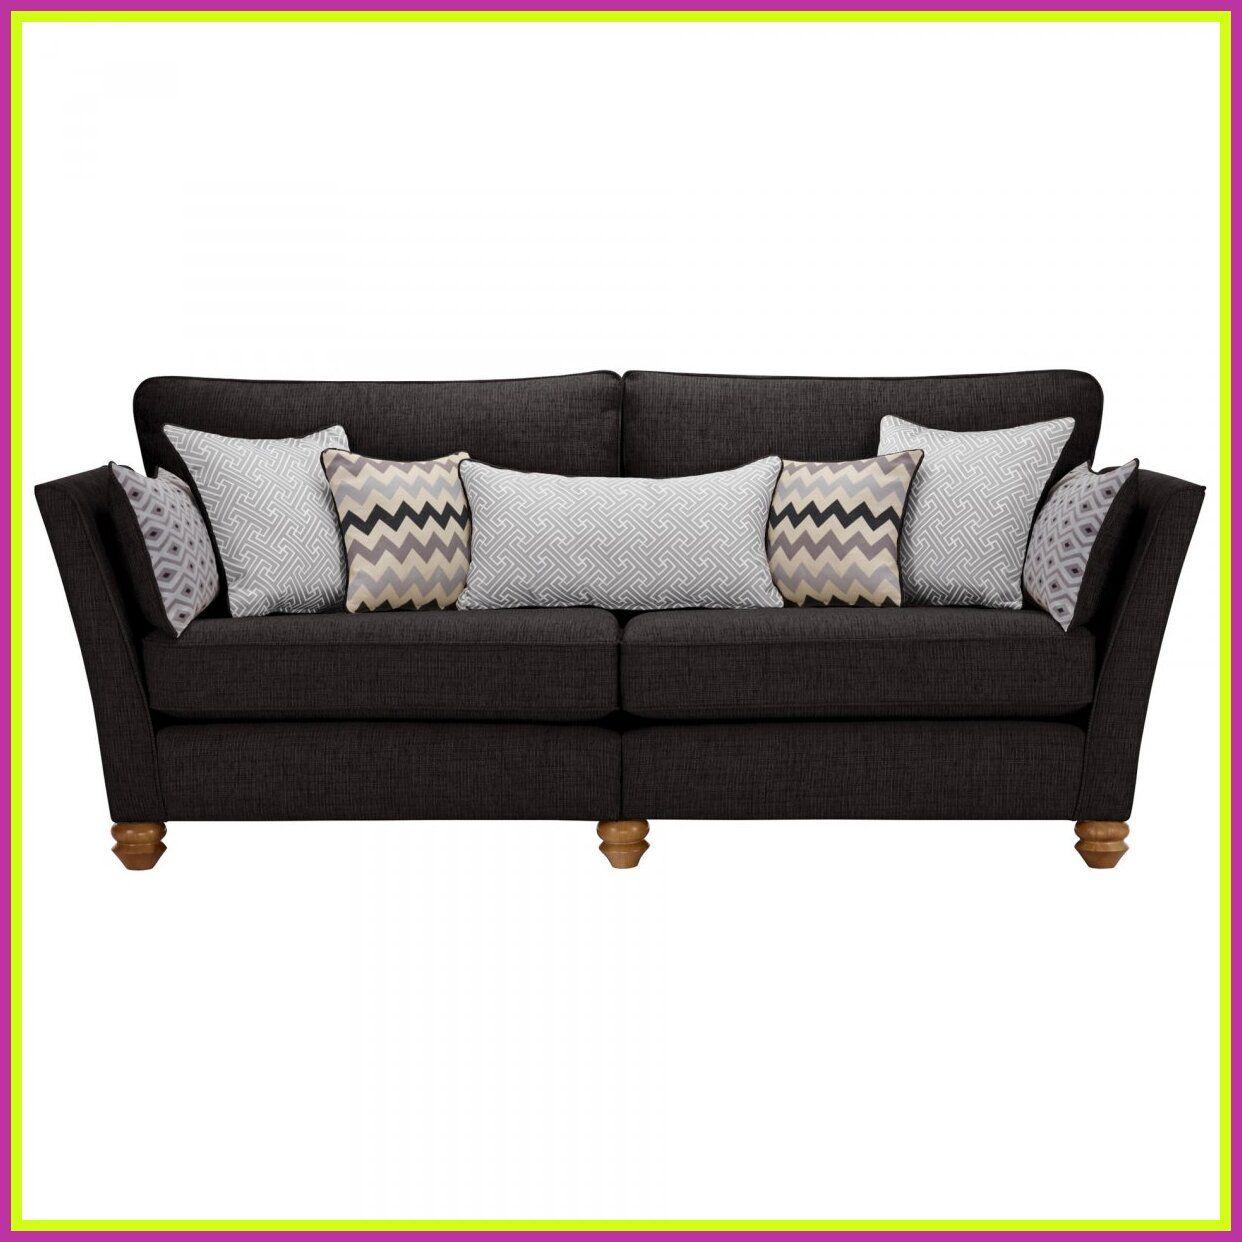 65 Reference Of Black Sofa With Oak Furniture Black Fabric Sofa Black Sofa Solid Oak Bedroom Furniture